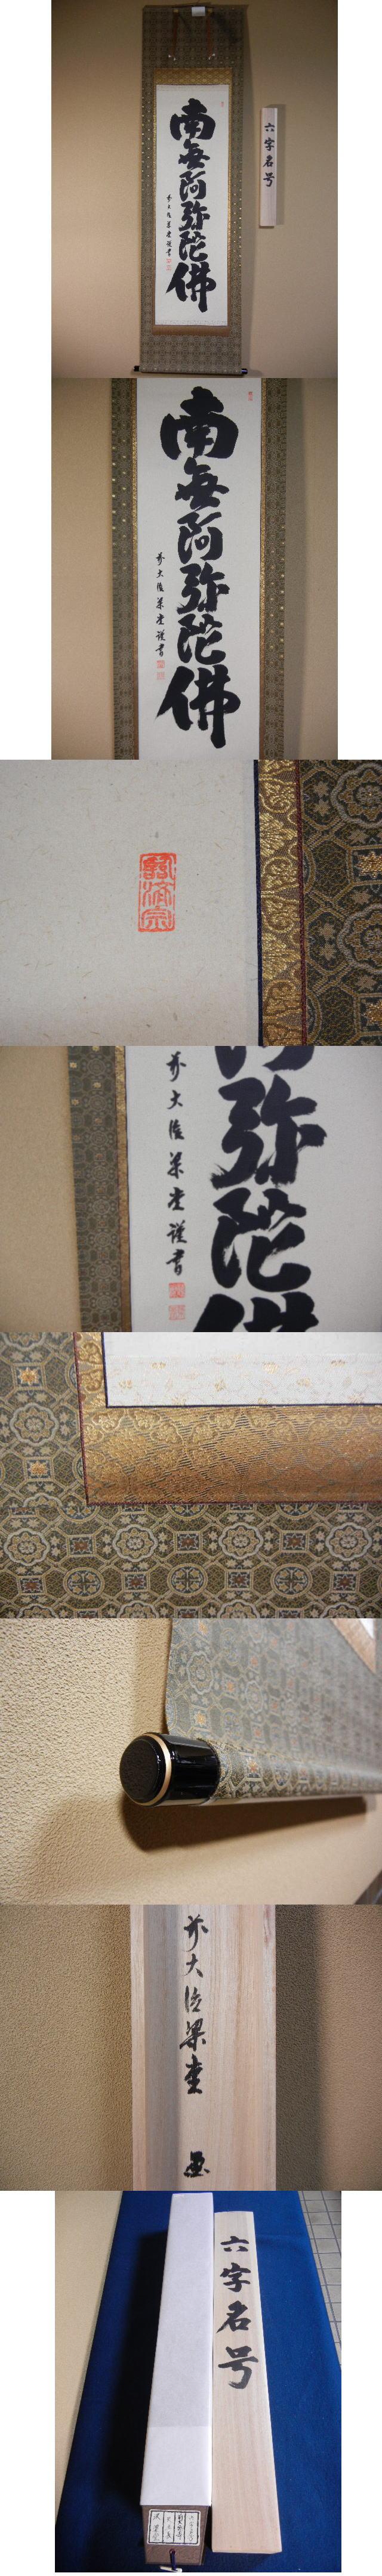 jikurokujisawa